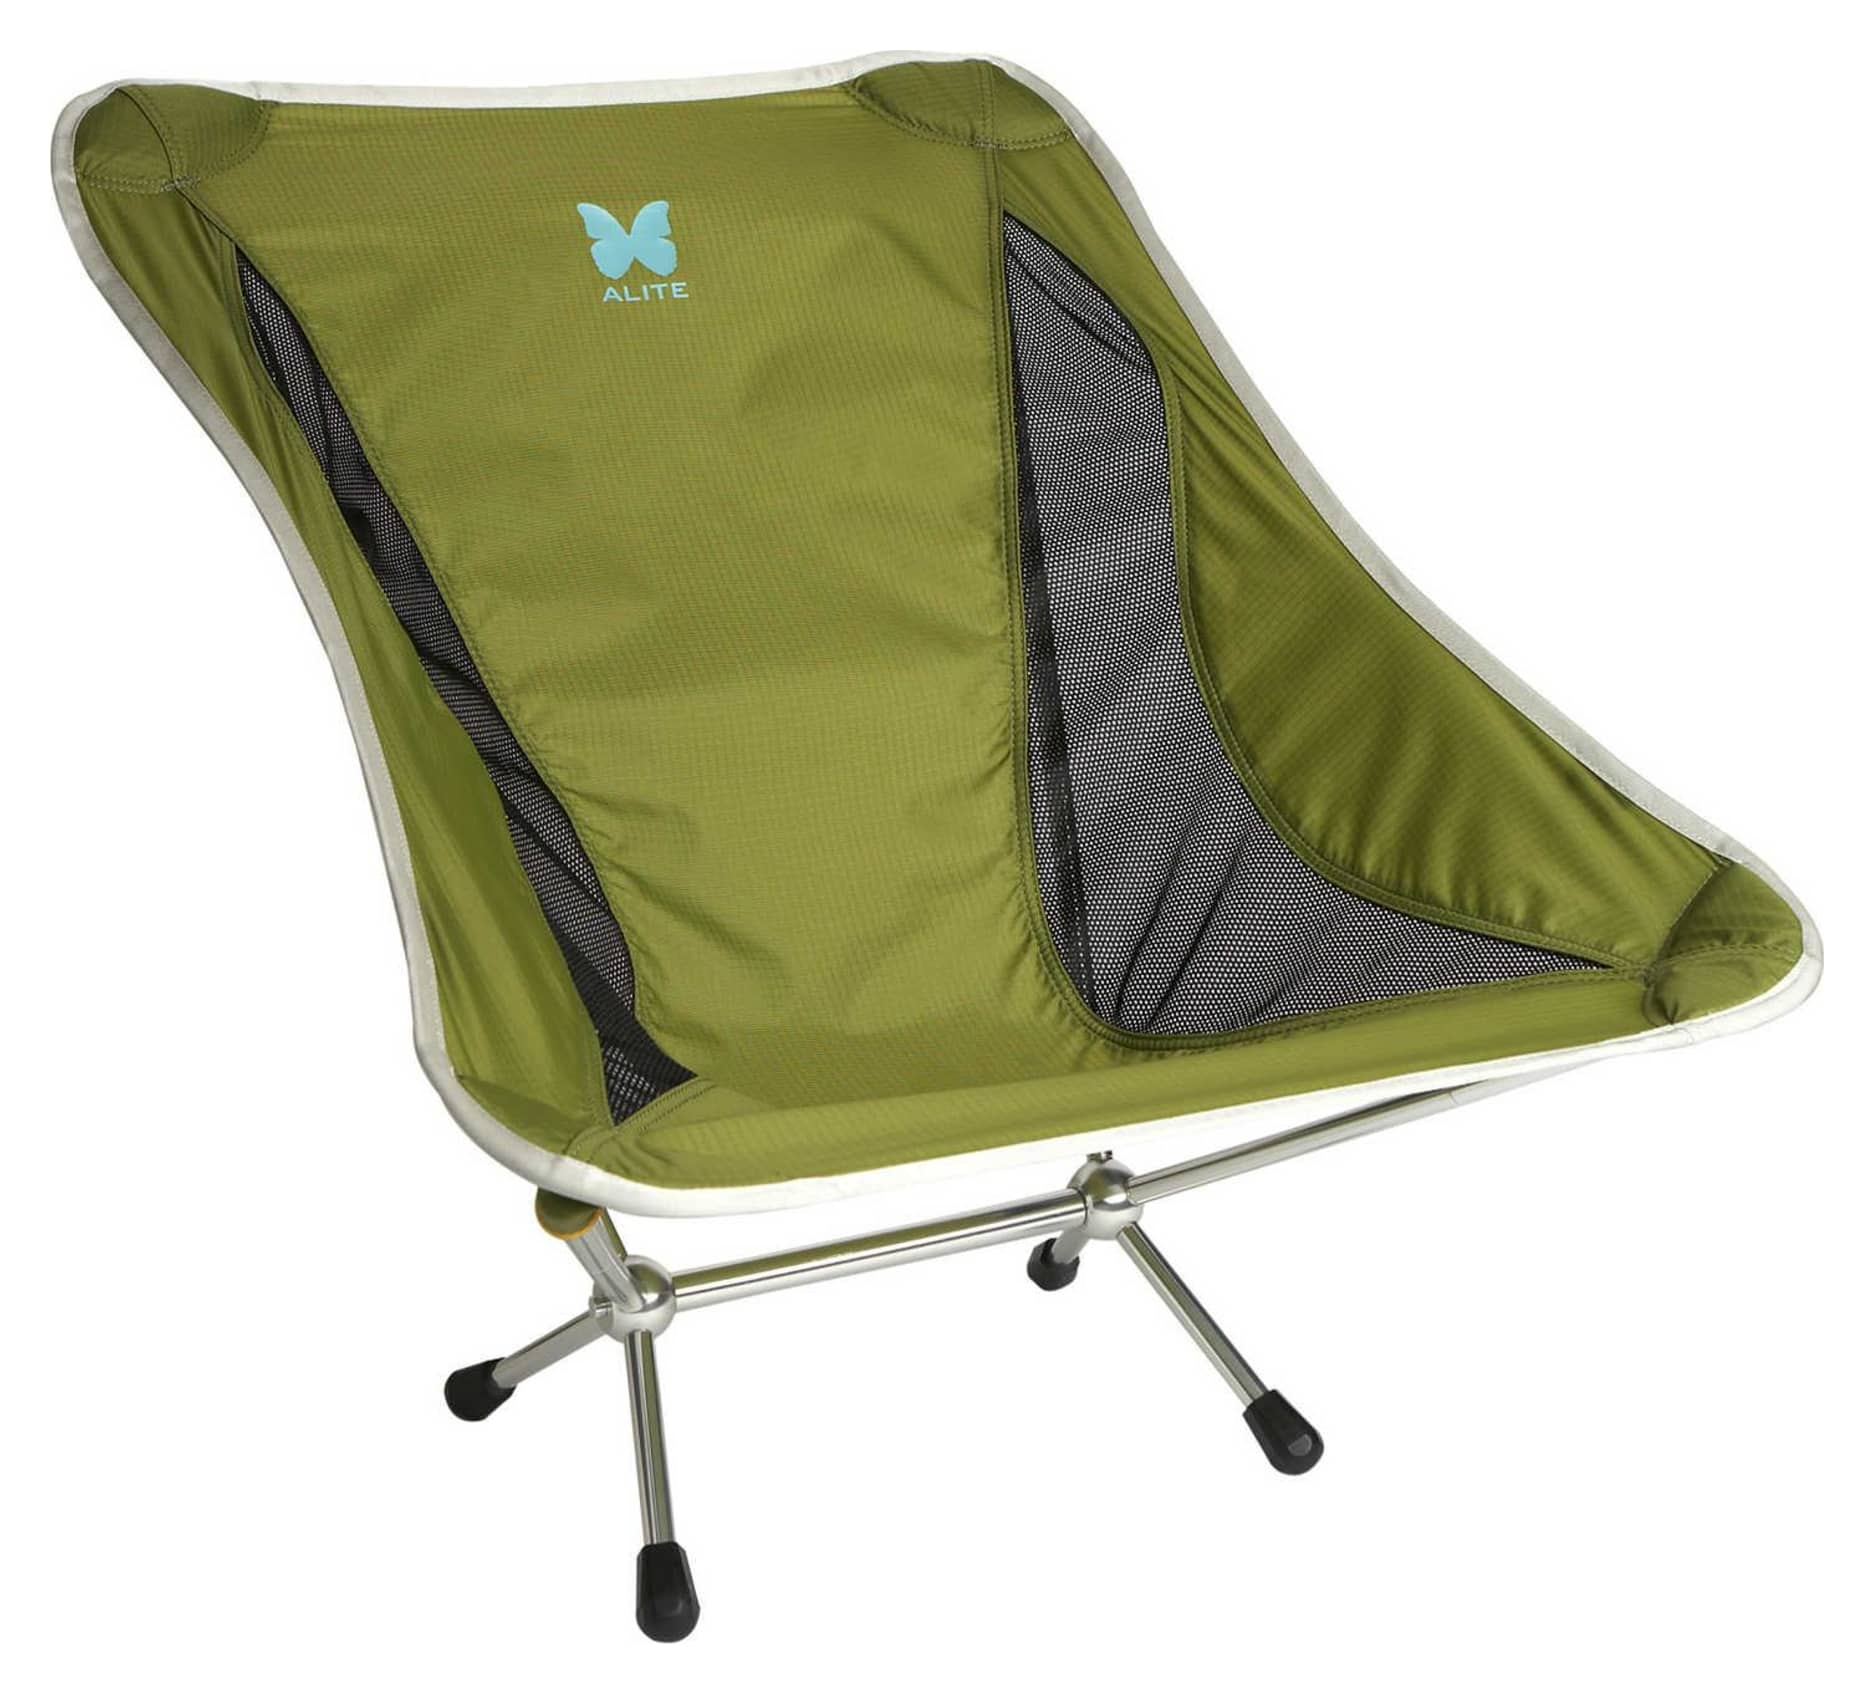 yeti folding chair that rocks alite mantis camping presidio green